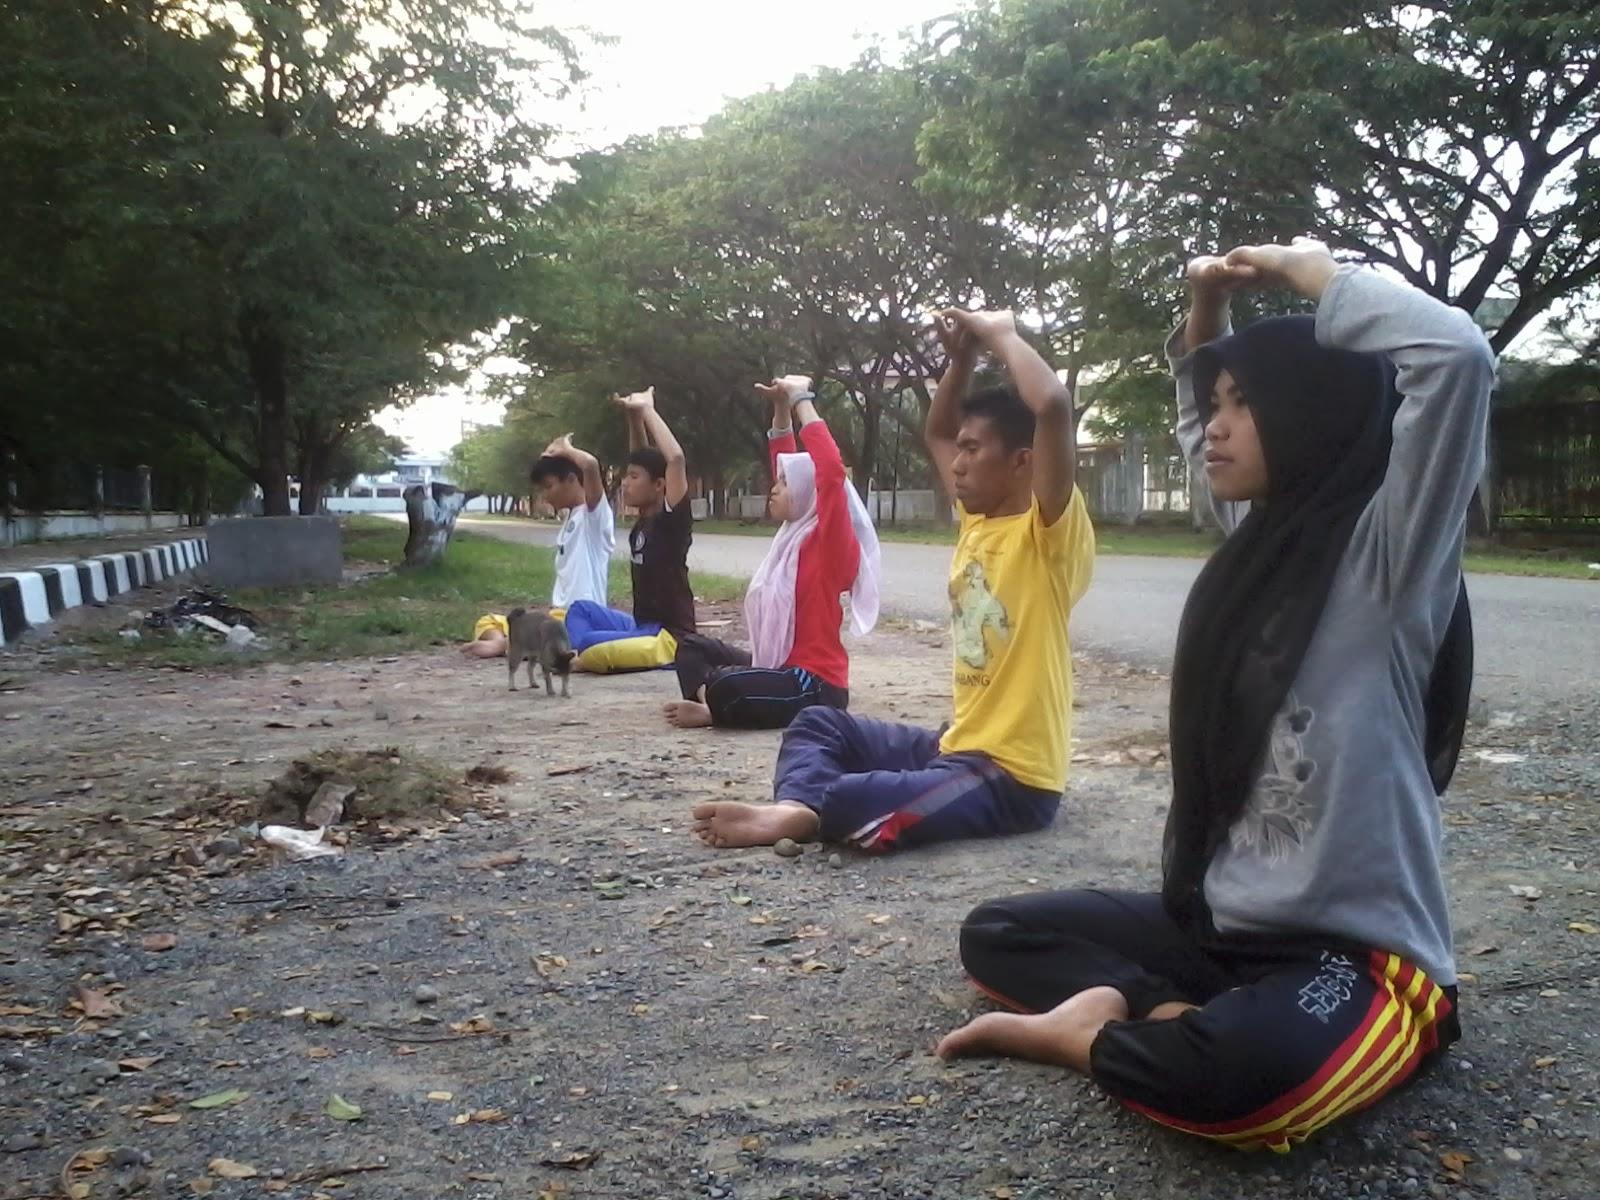 Latihan elementer bersama benih #12 Teater Rongsokan Aceh